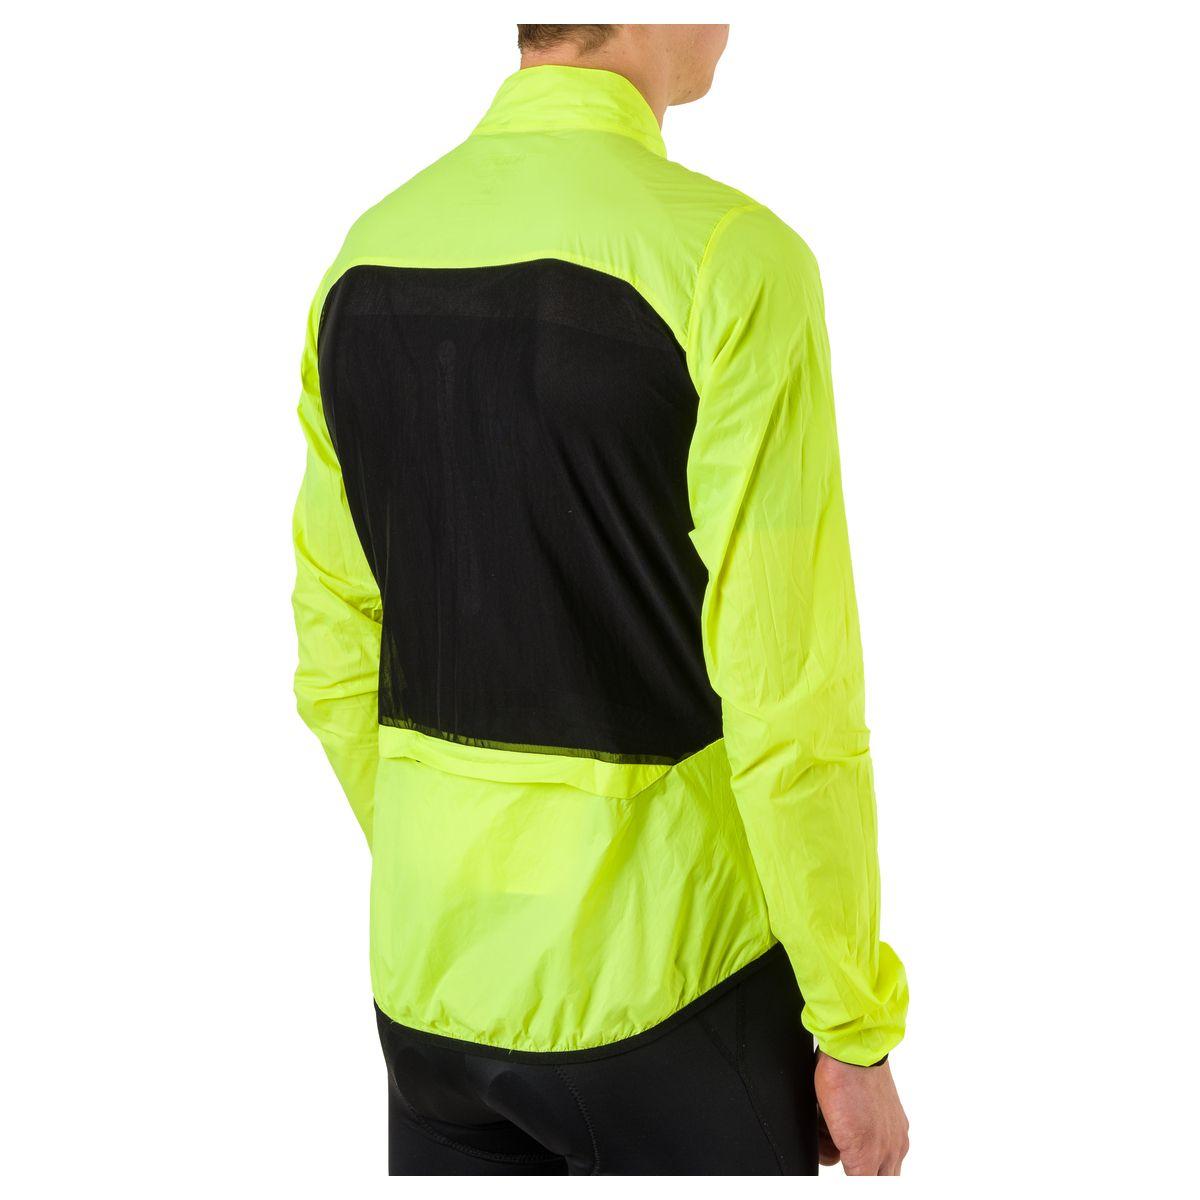 Wind Jacket II Essential Men fit example